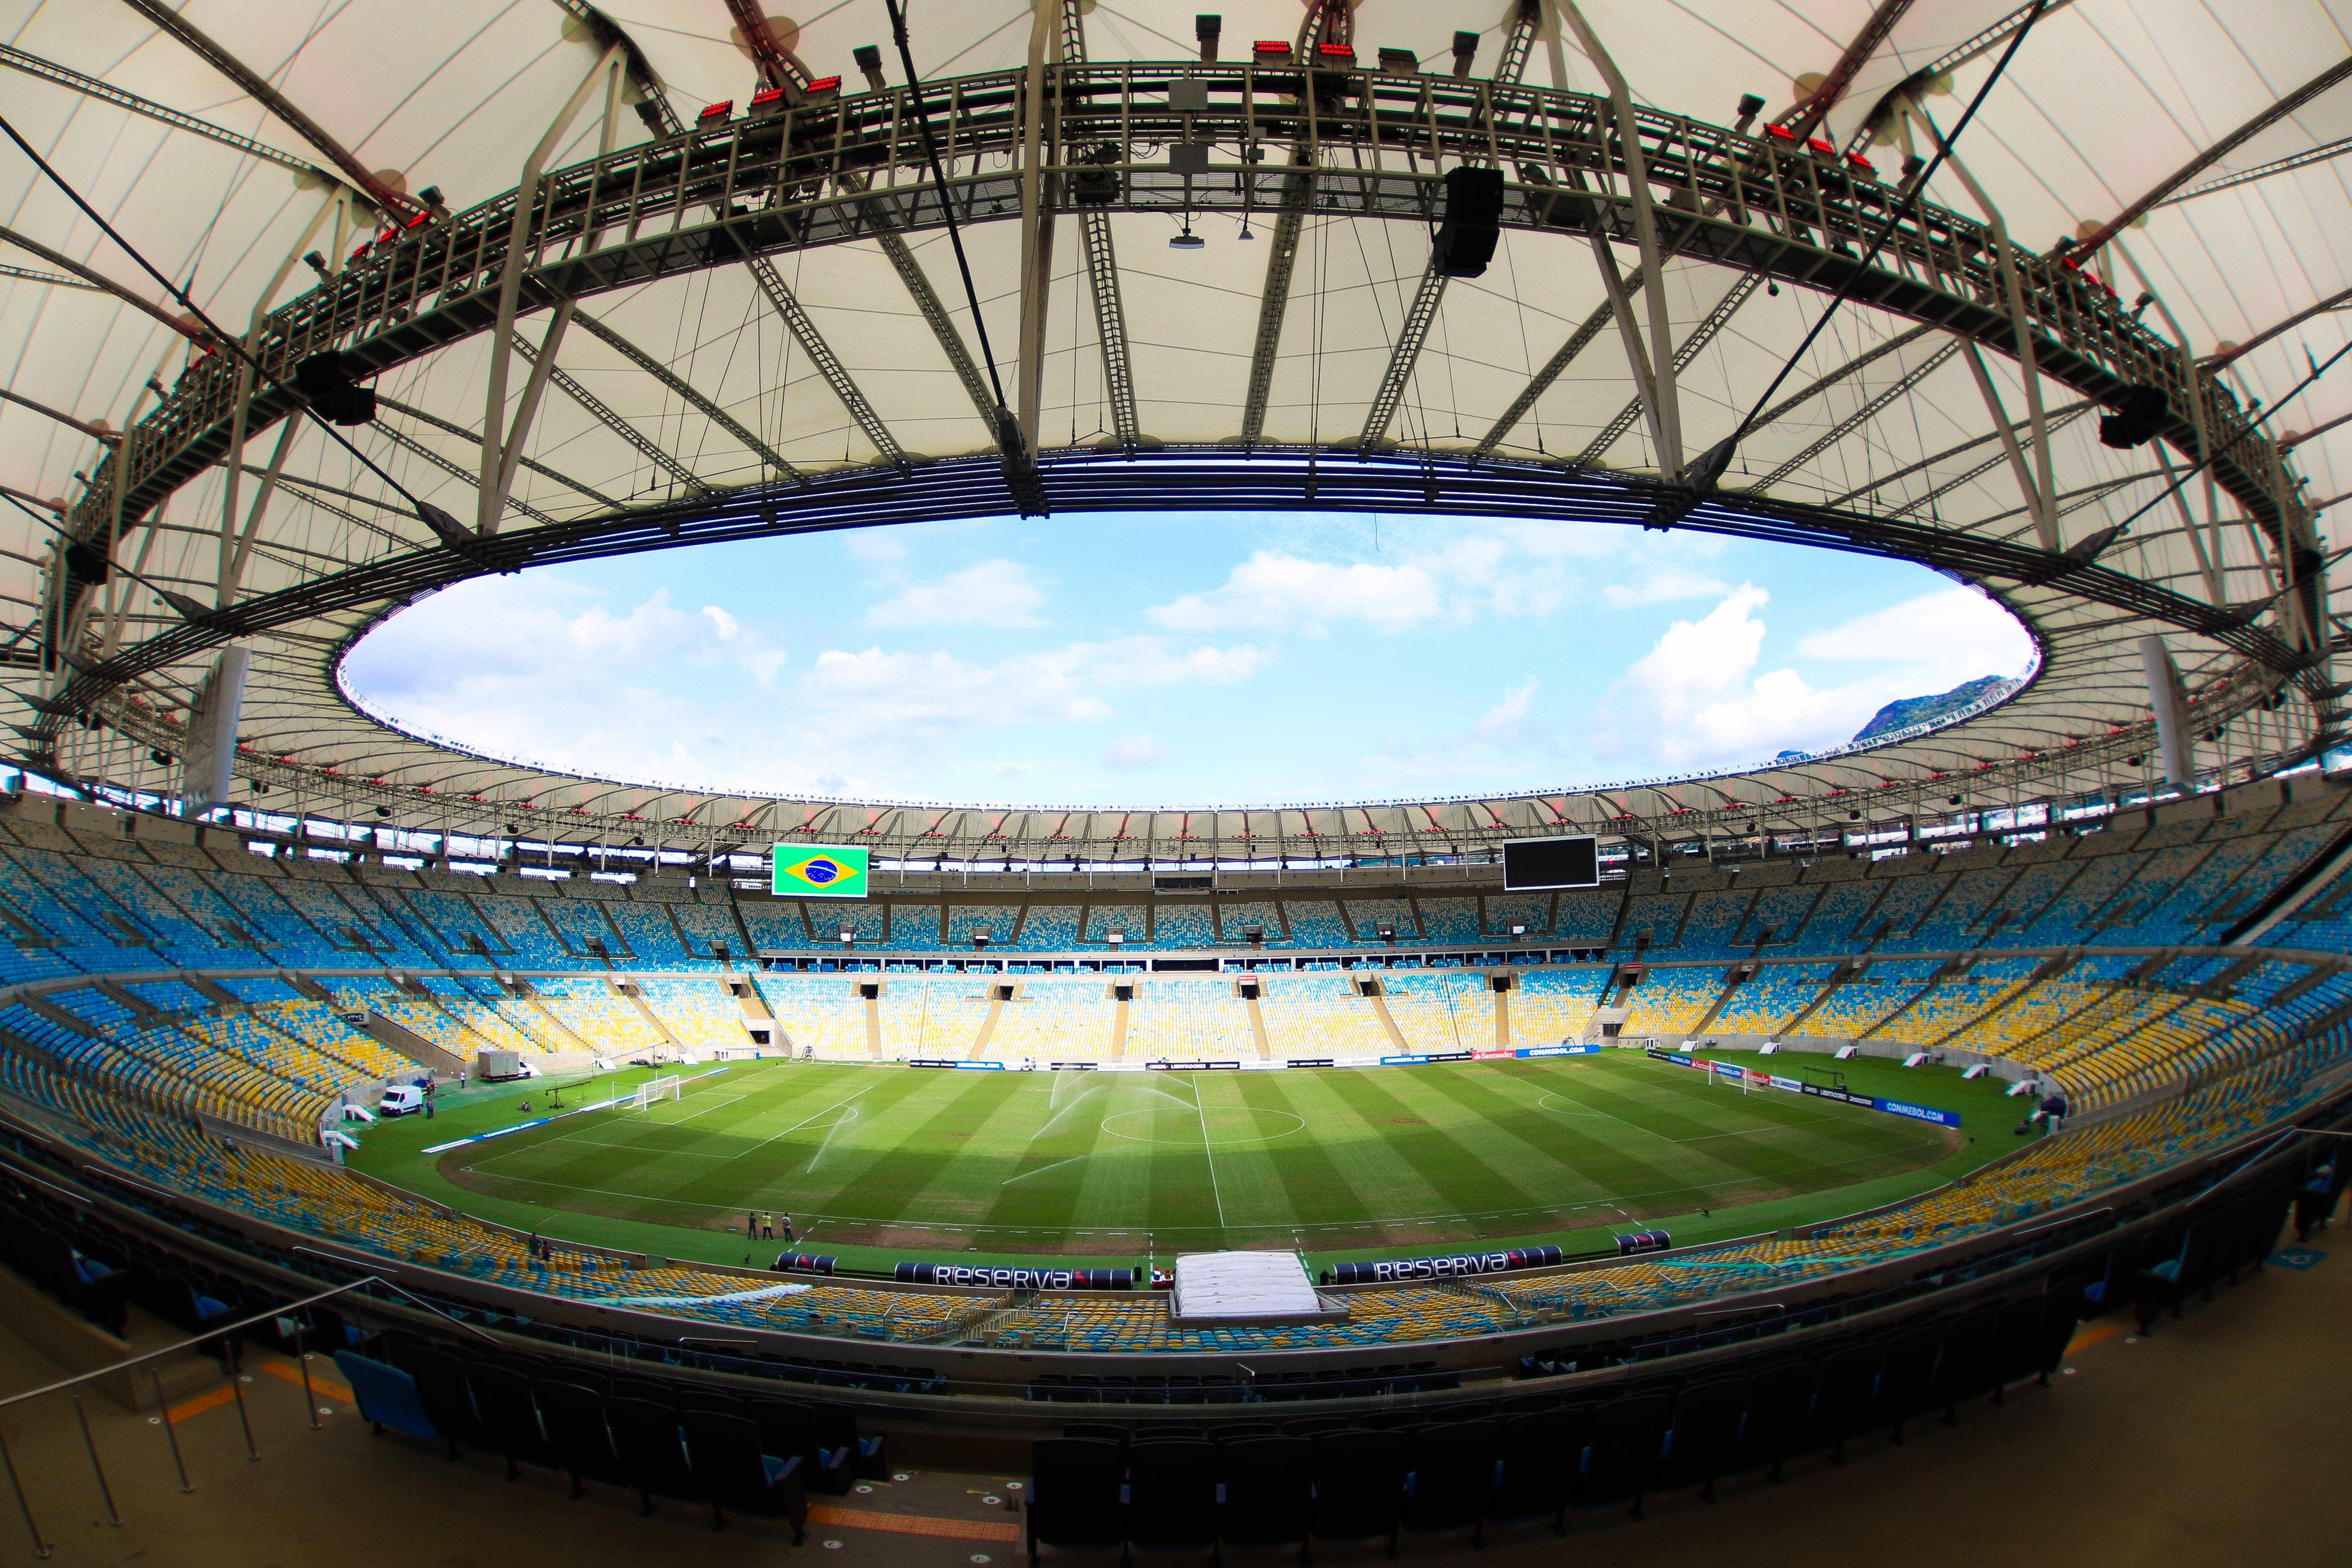 Rodada final da Taça Rio tem Fla-Flu e semi do Carioca em aberto